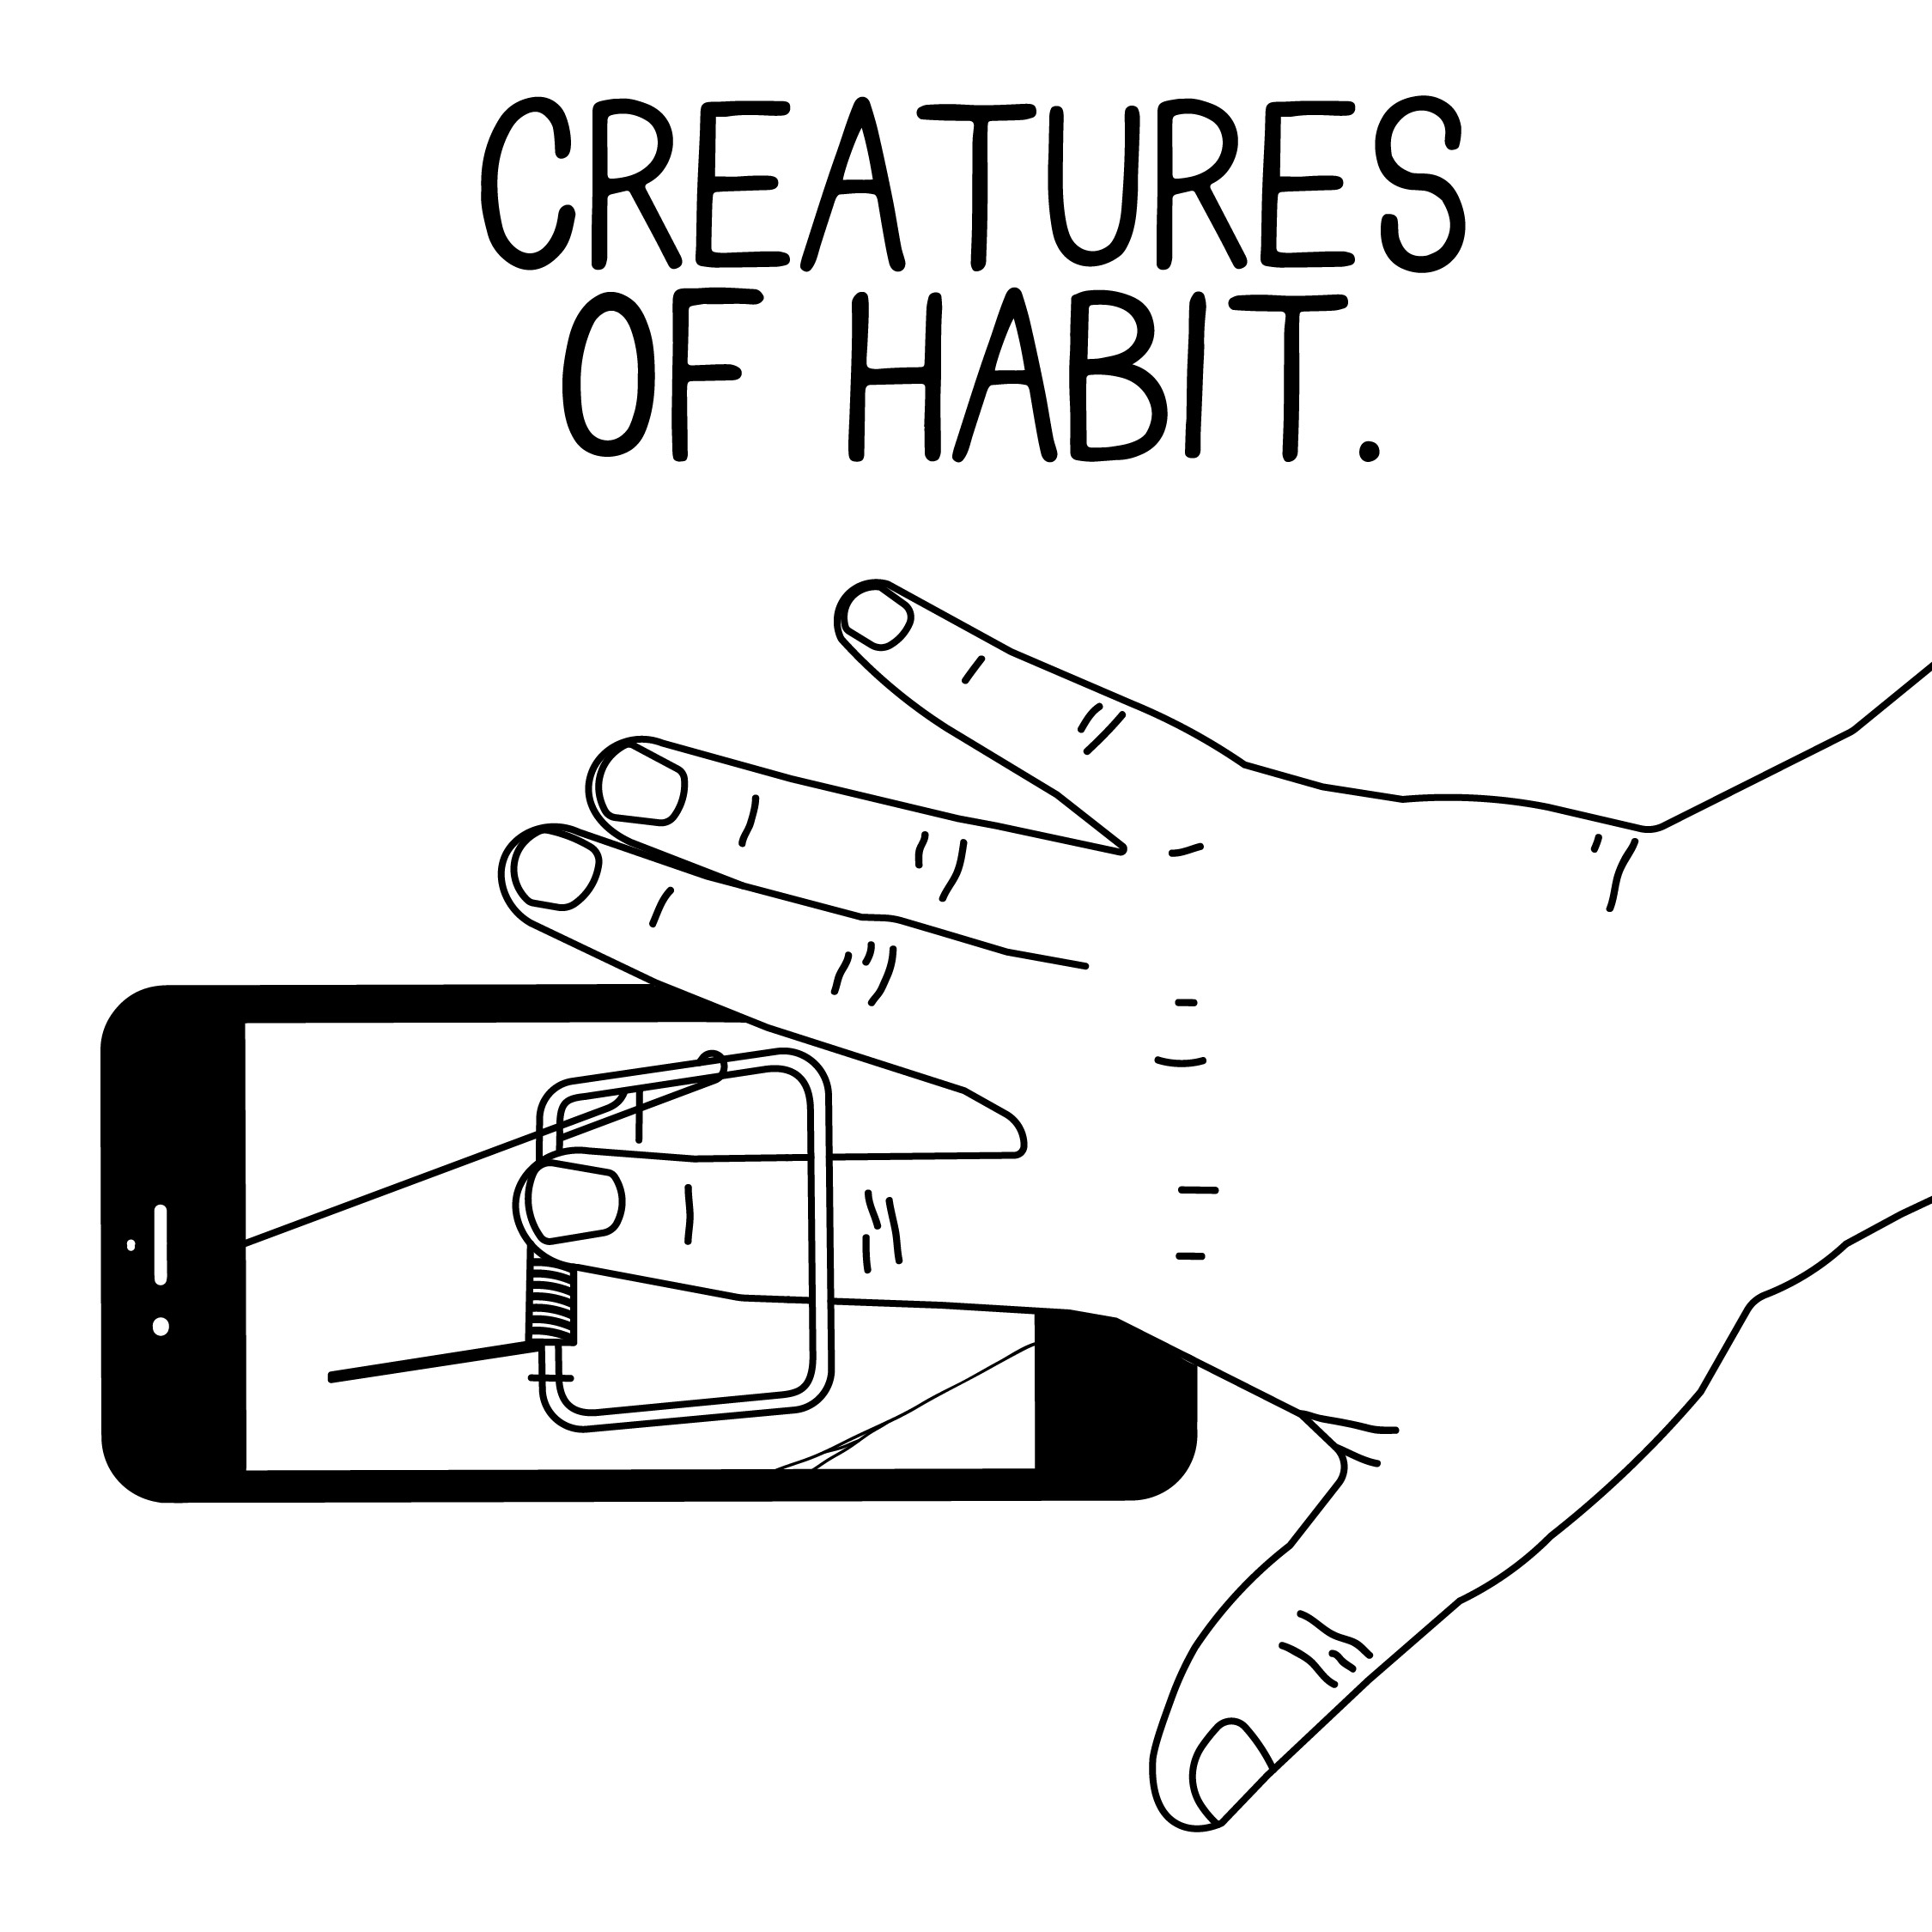 creaturesofhabit-01.jpg